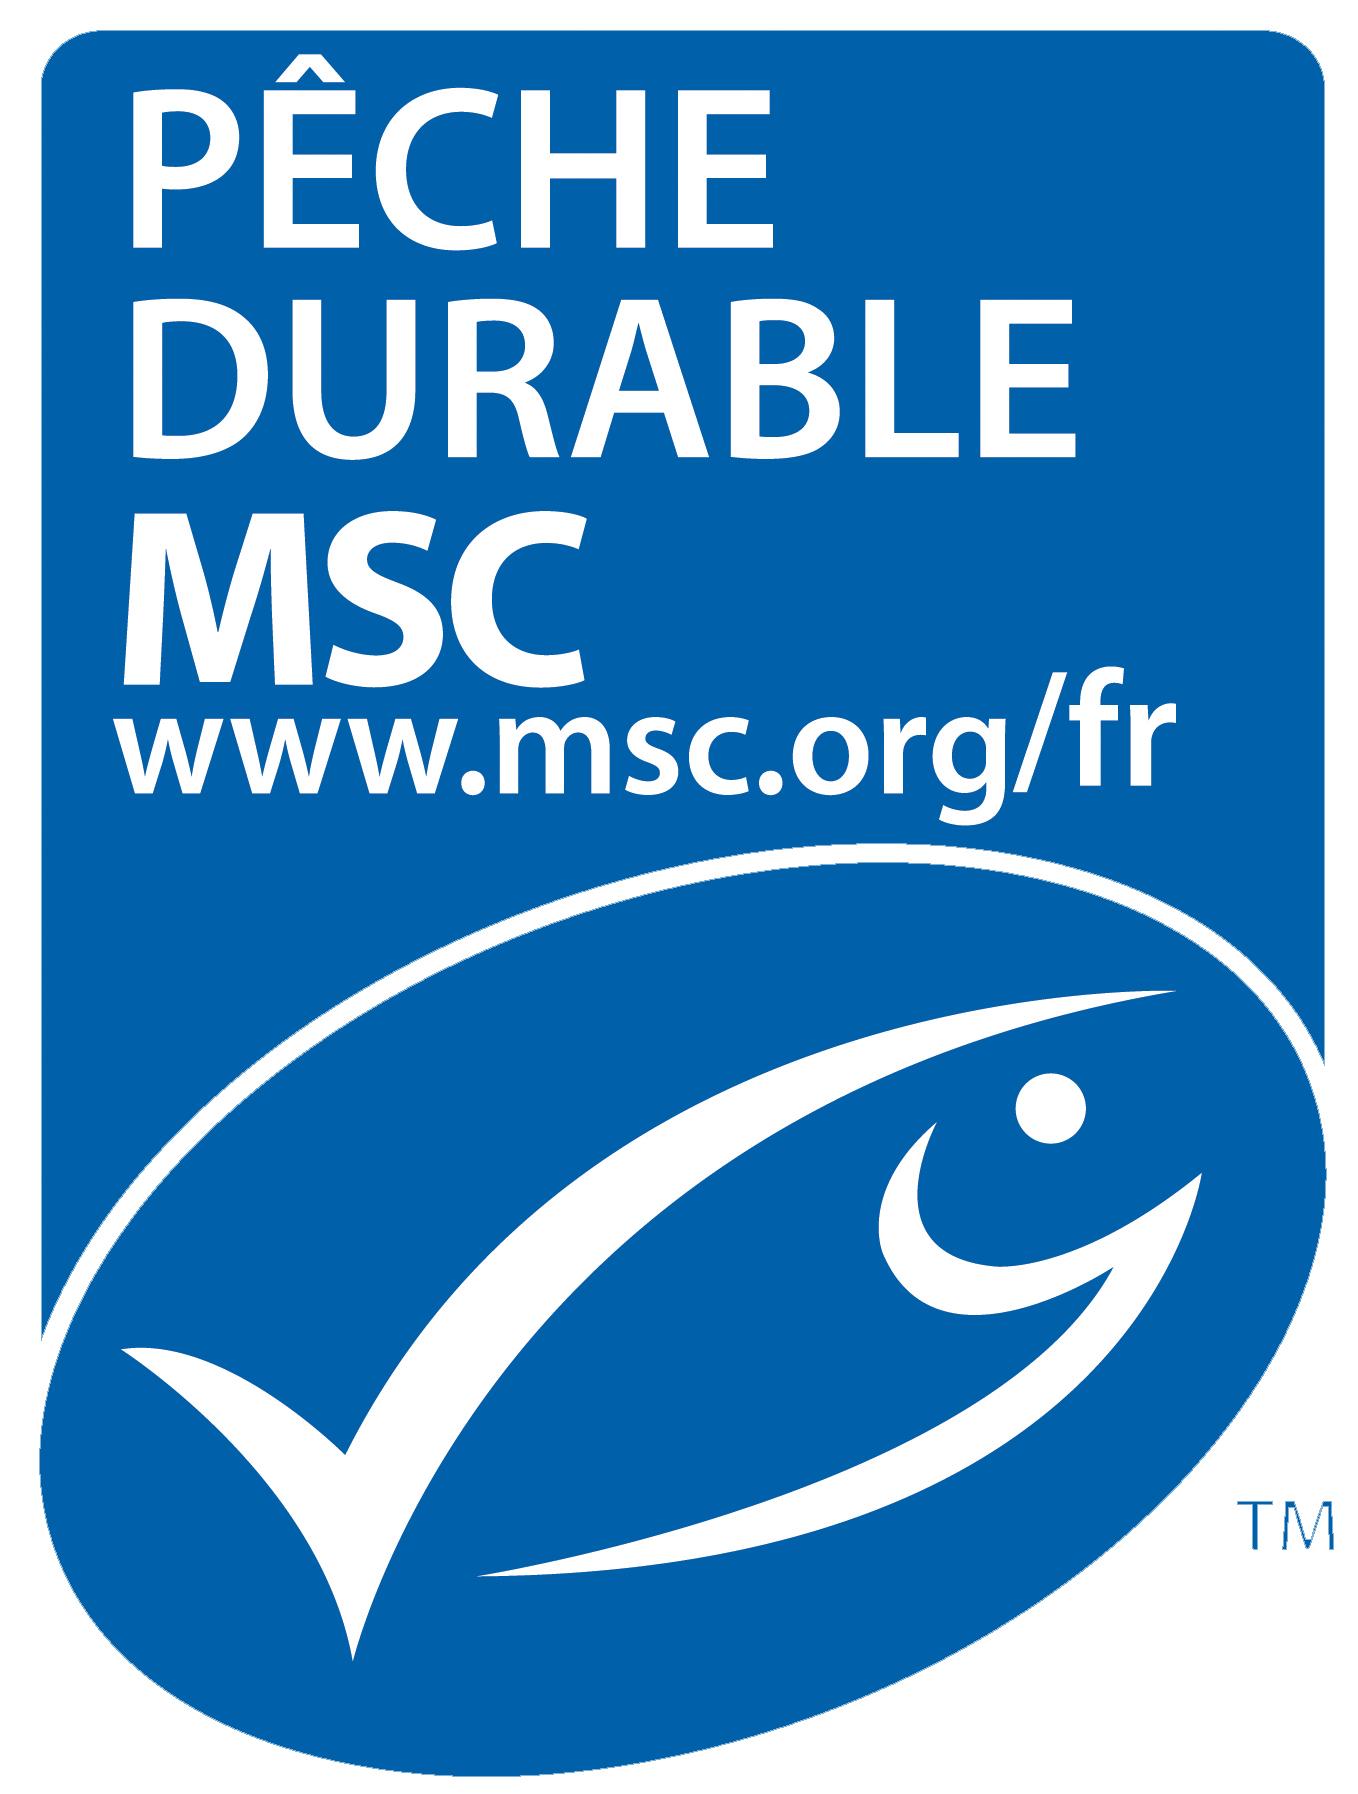 MSC_peche_durable